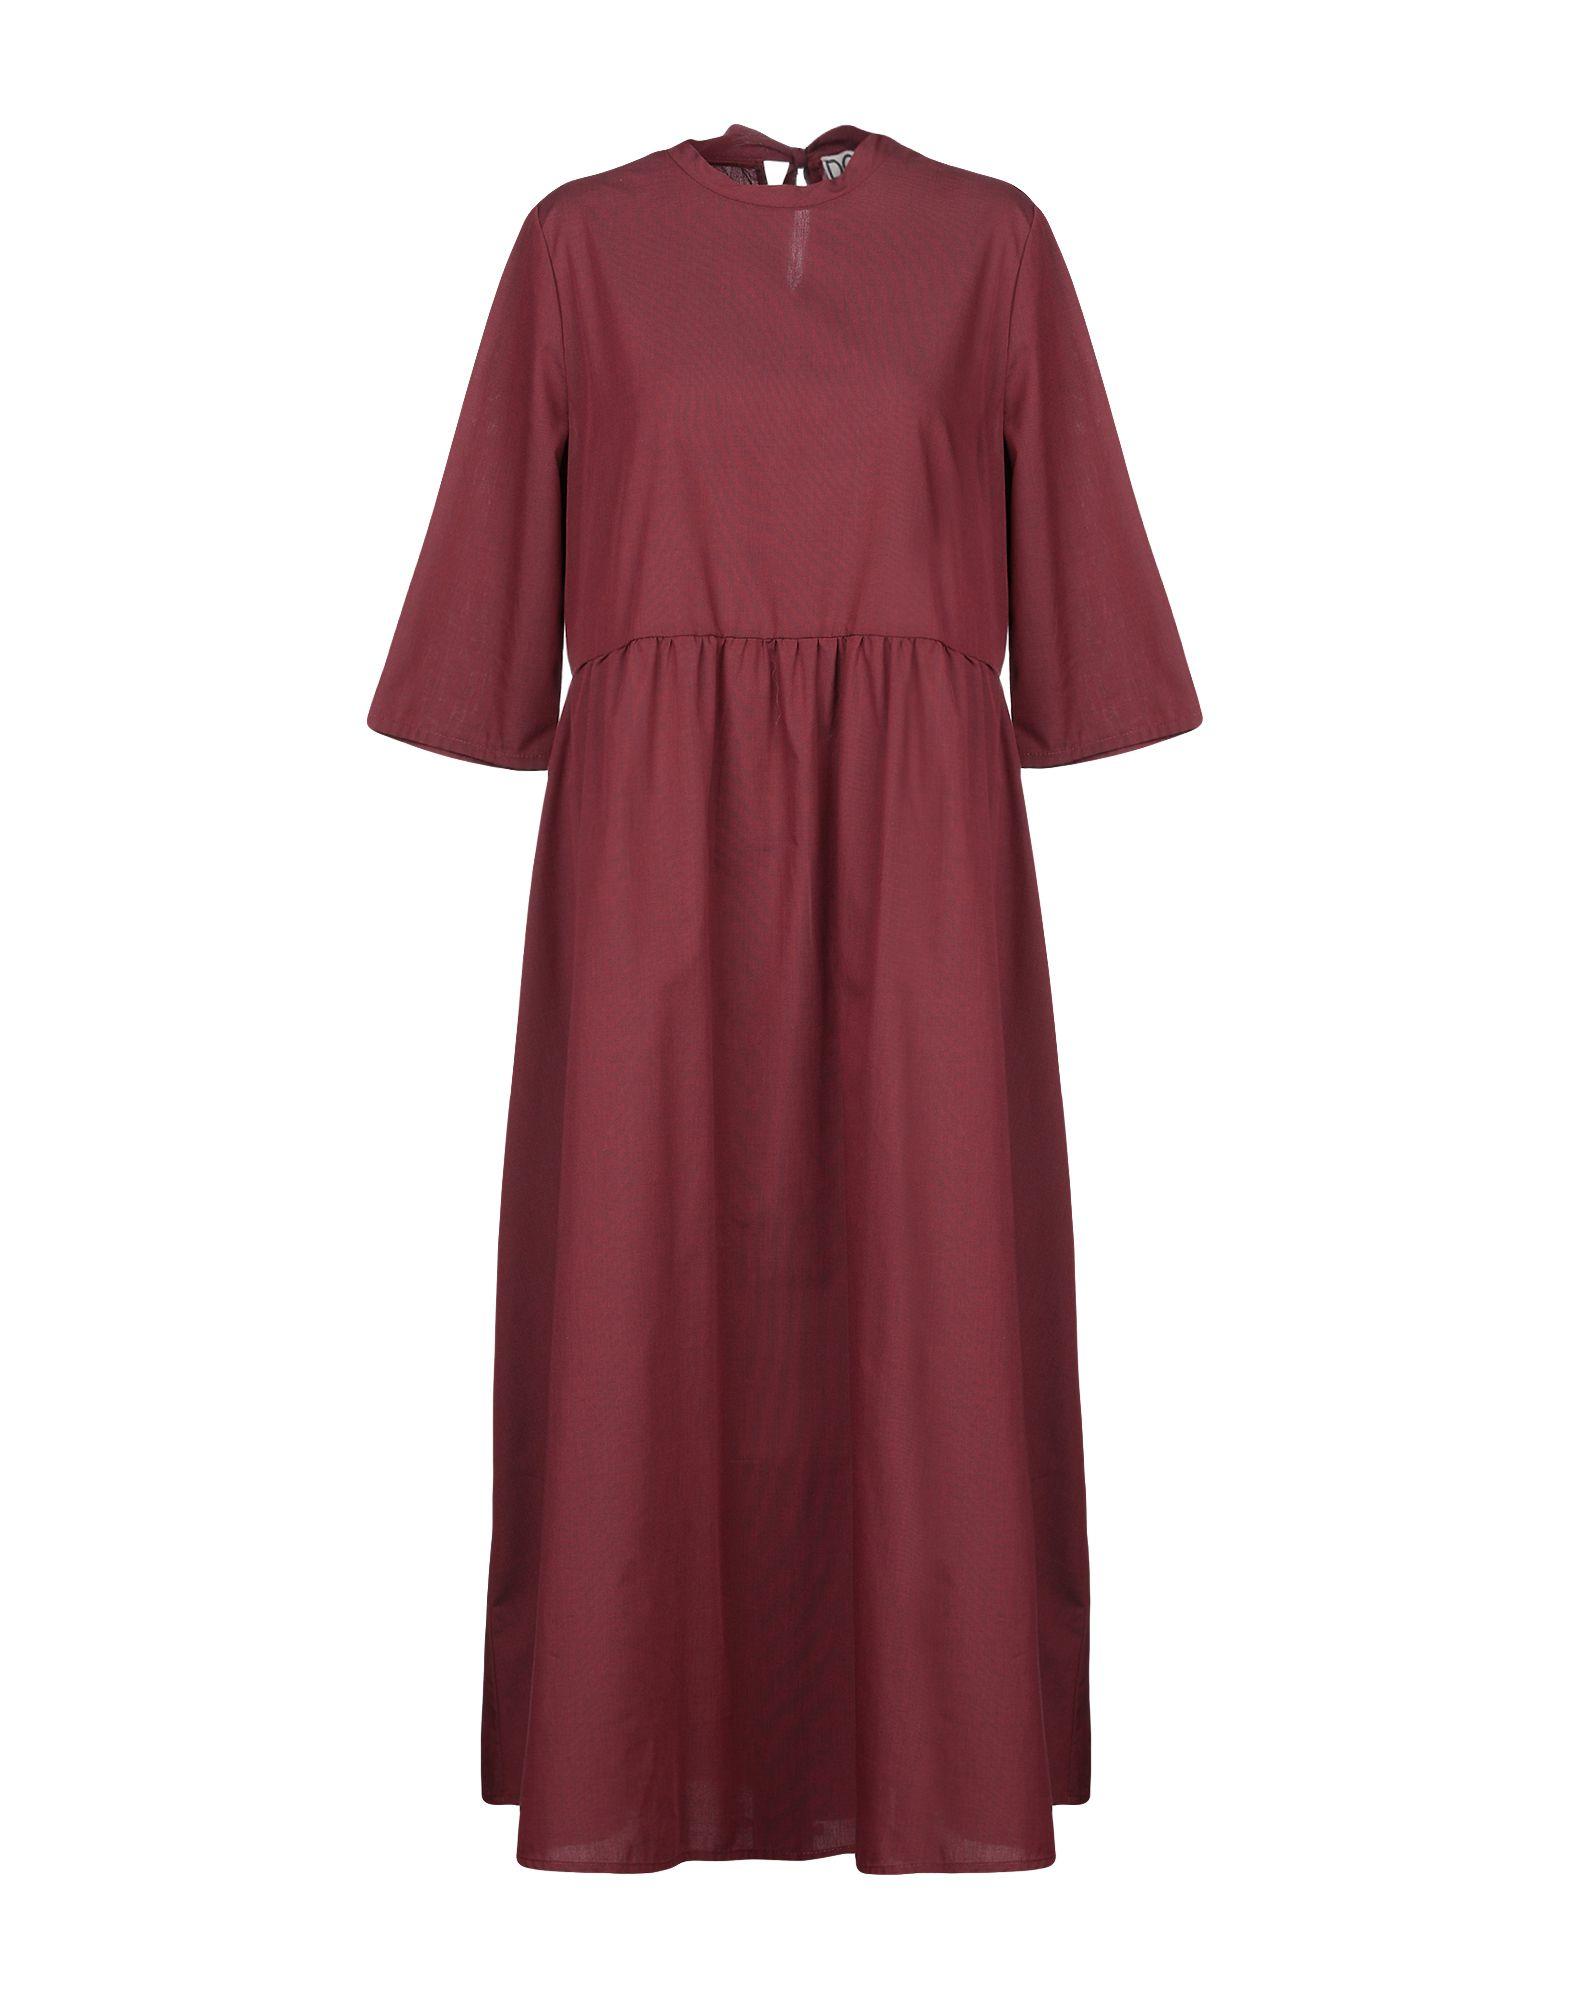 DOUUOD Платье длиной 3/4 woolrich платье длиной 3 4